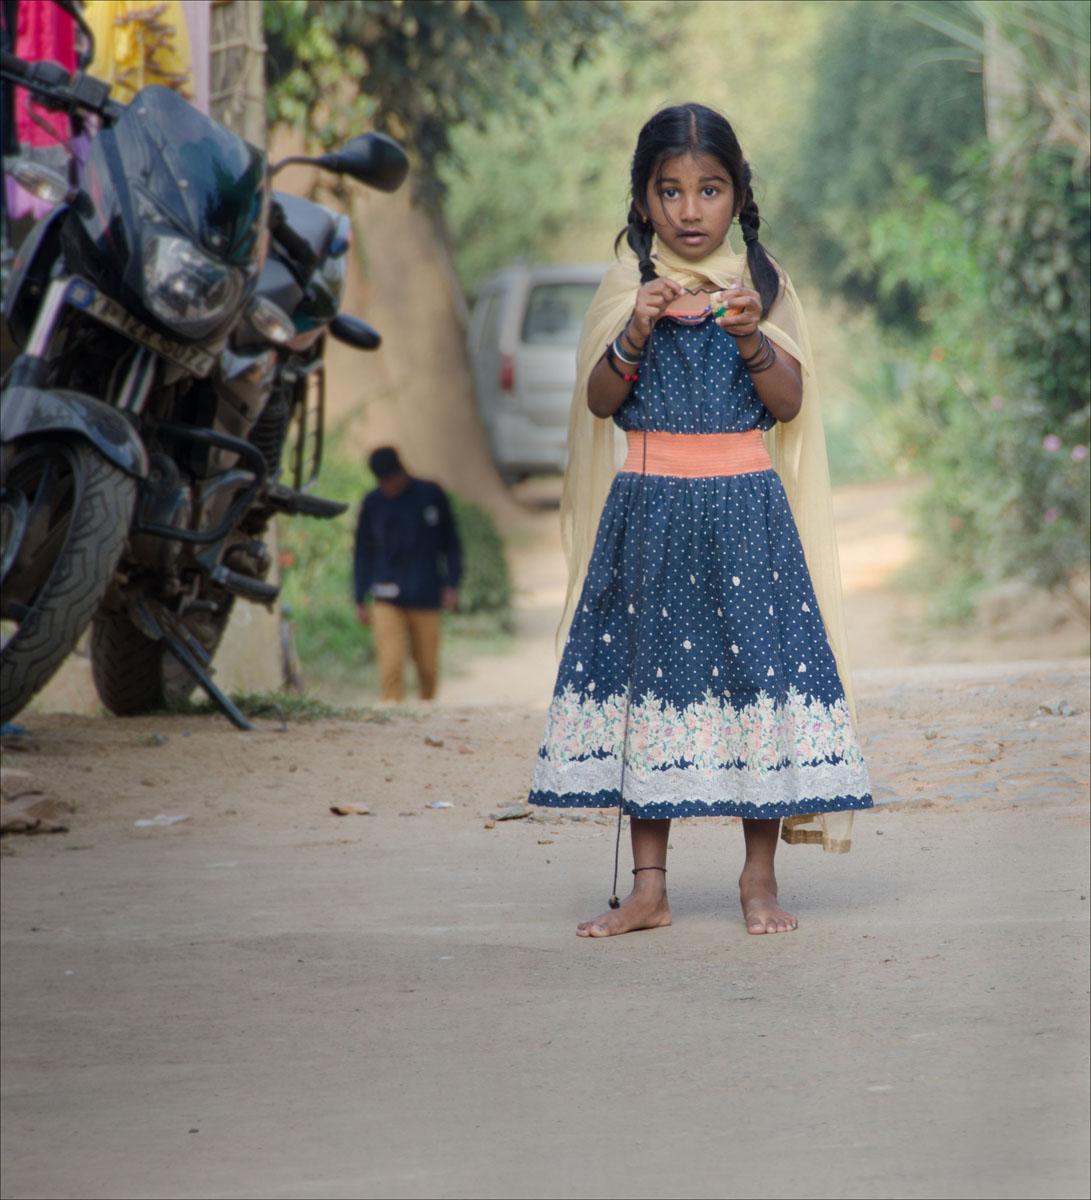 Girl next to bike